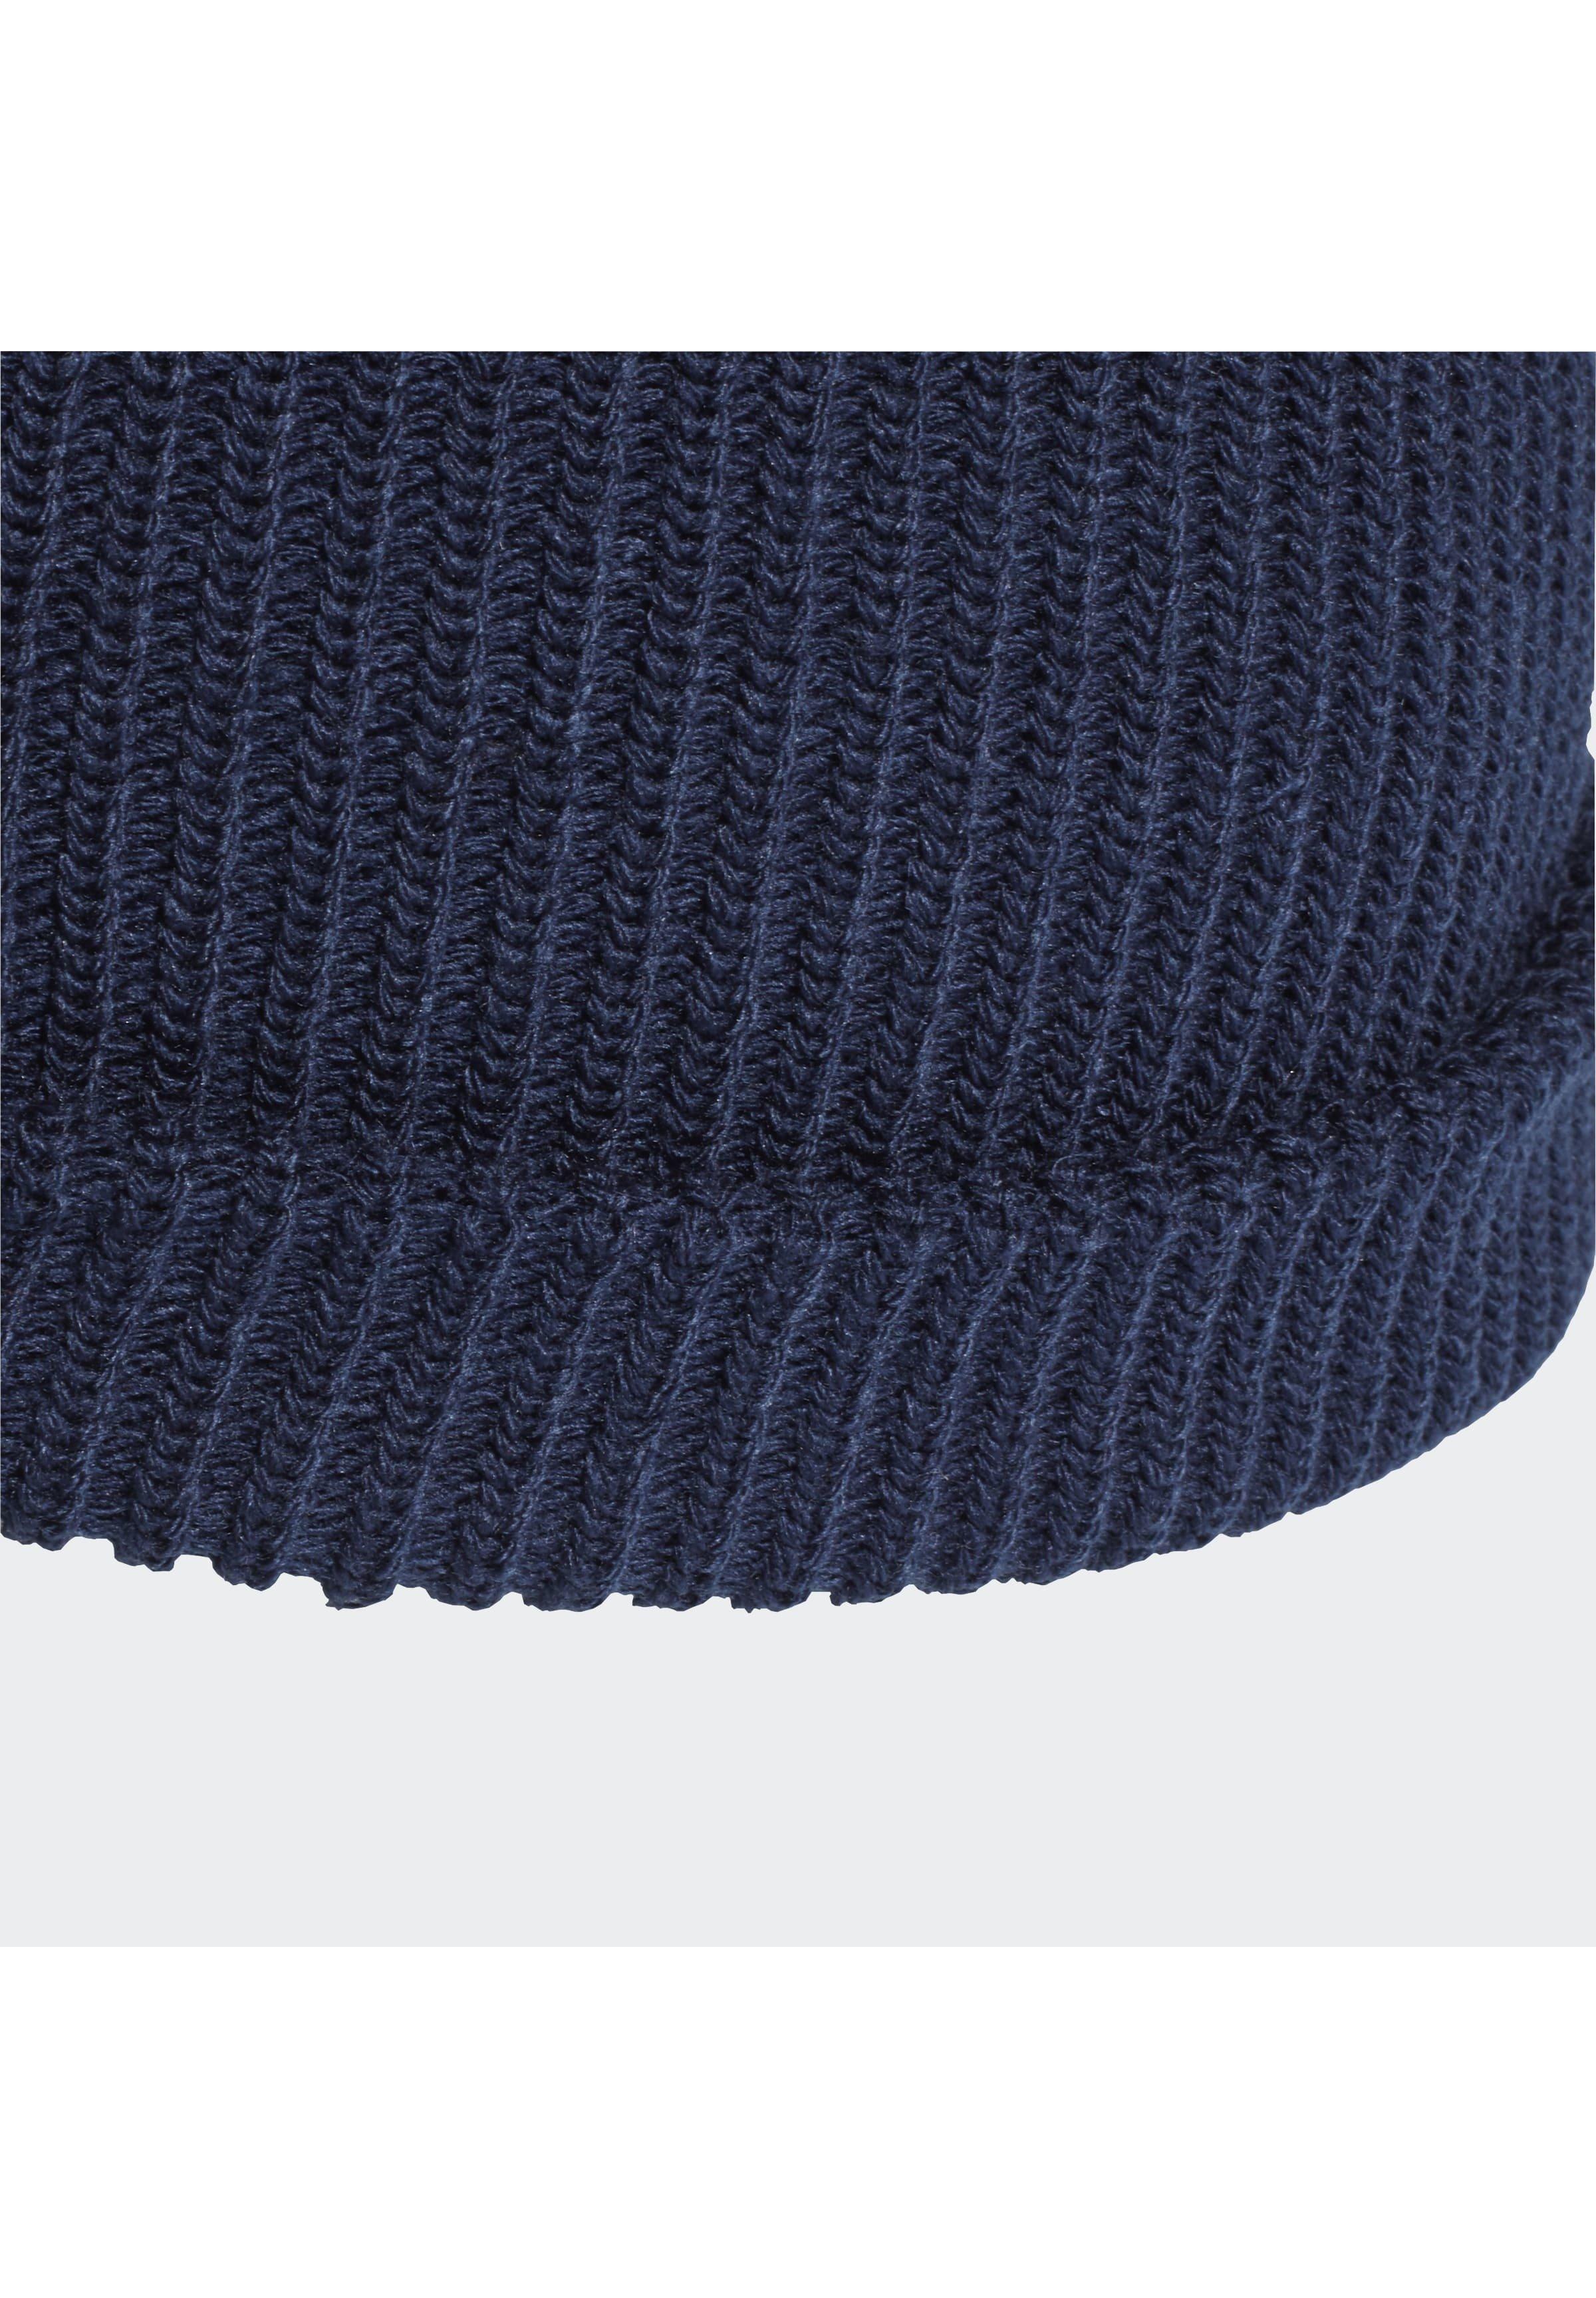 adidas Originals Lue - blue/blå uQJ8nxaa5GC3AAh